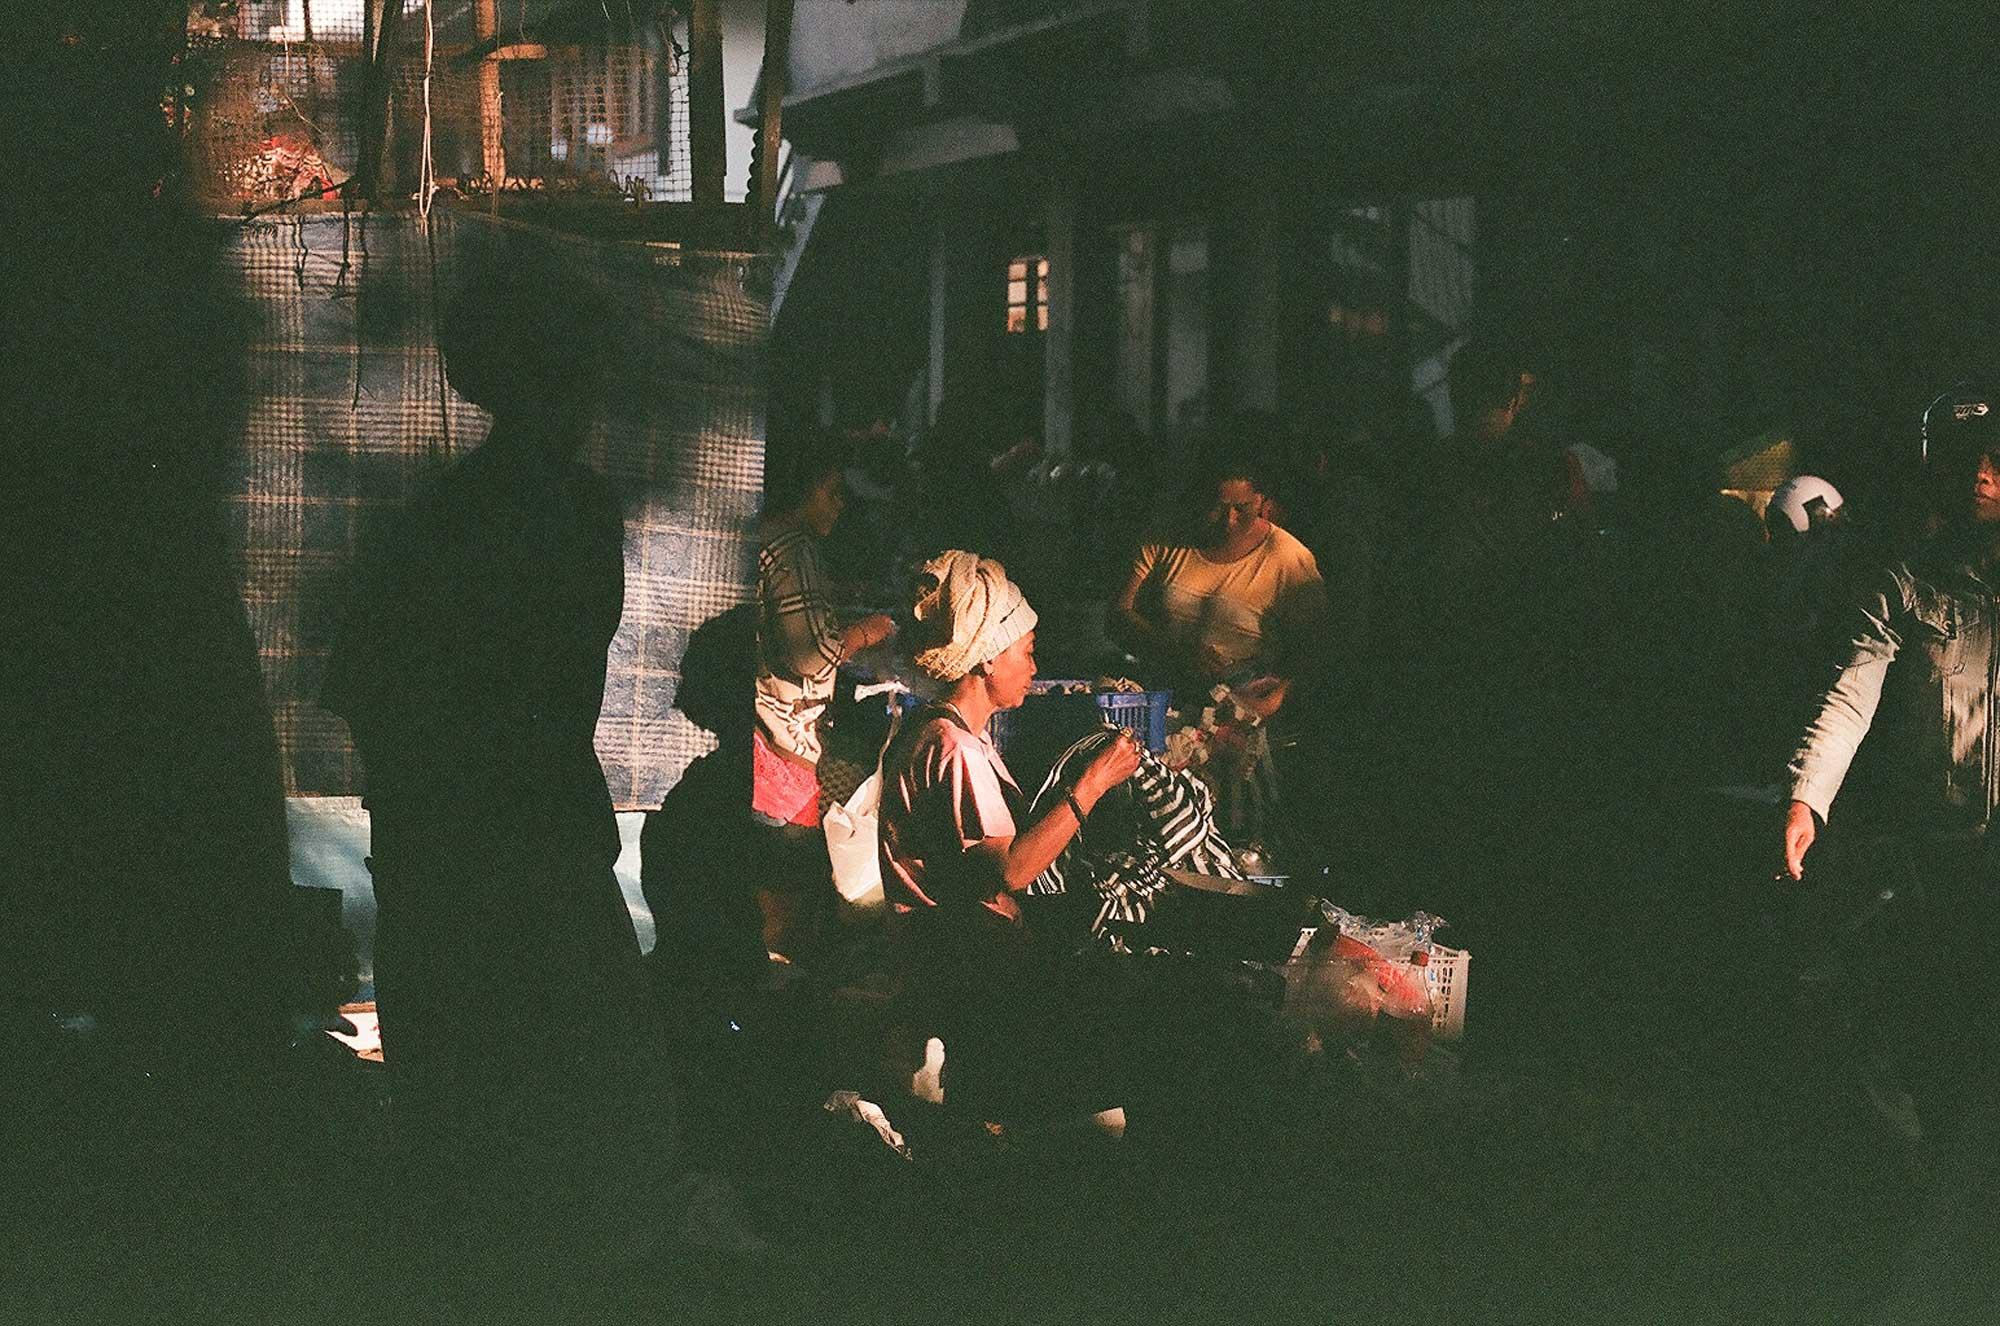 Pasar Ubud on 35mm film by Bali Street Photographer